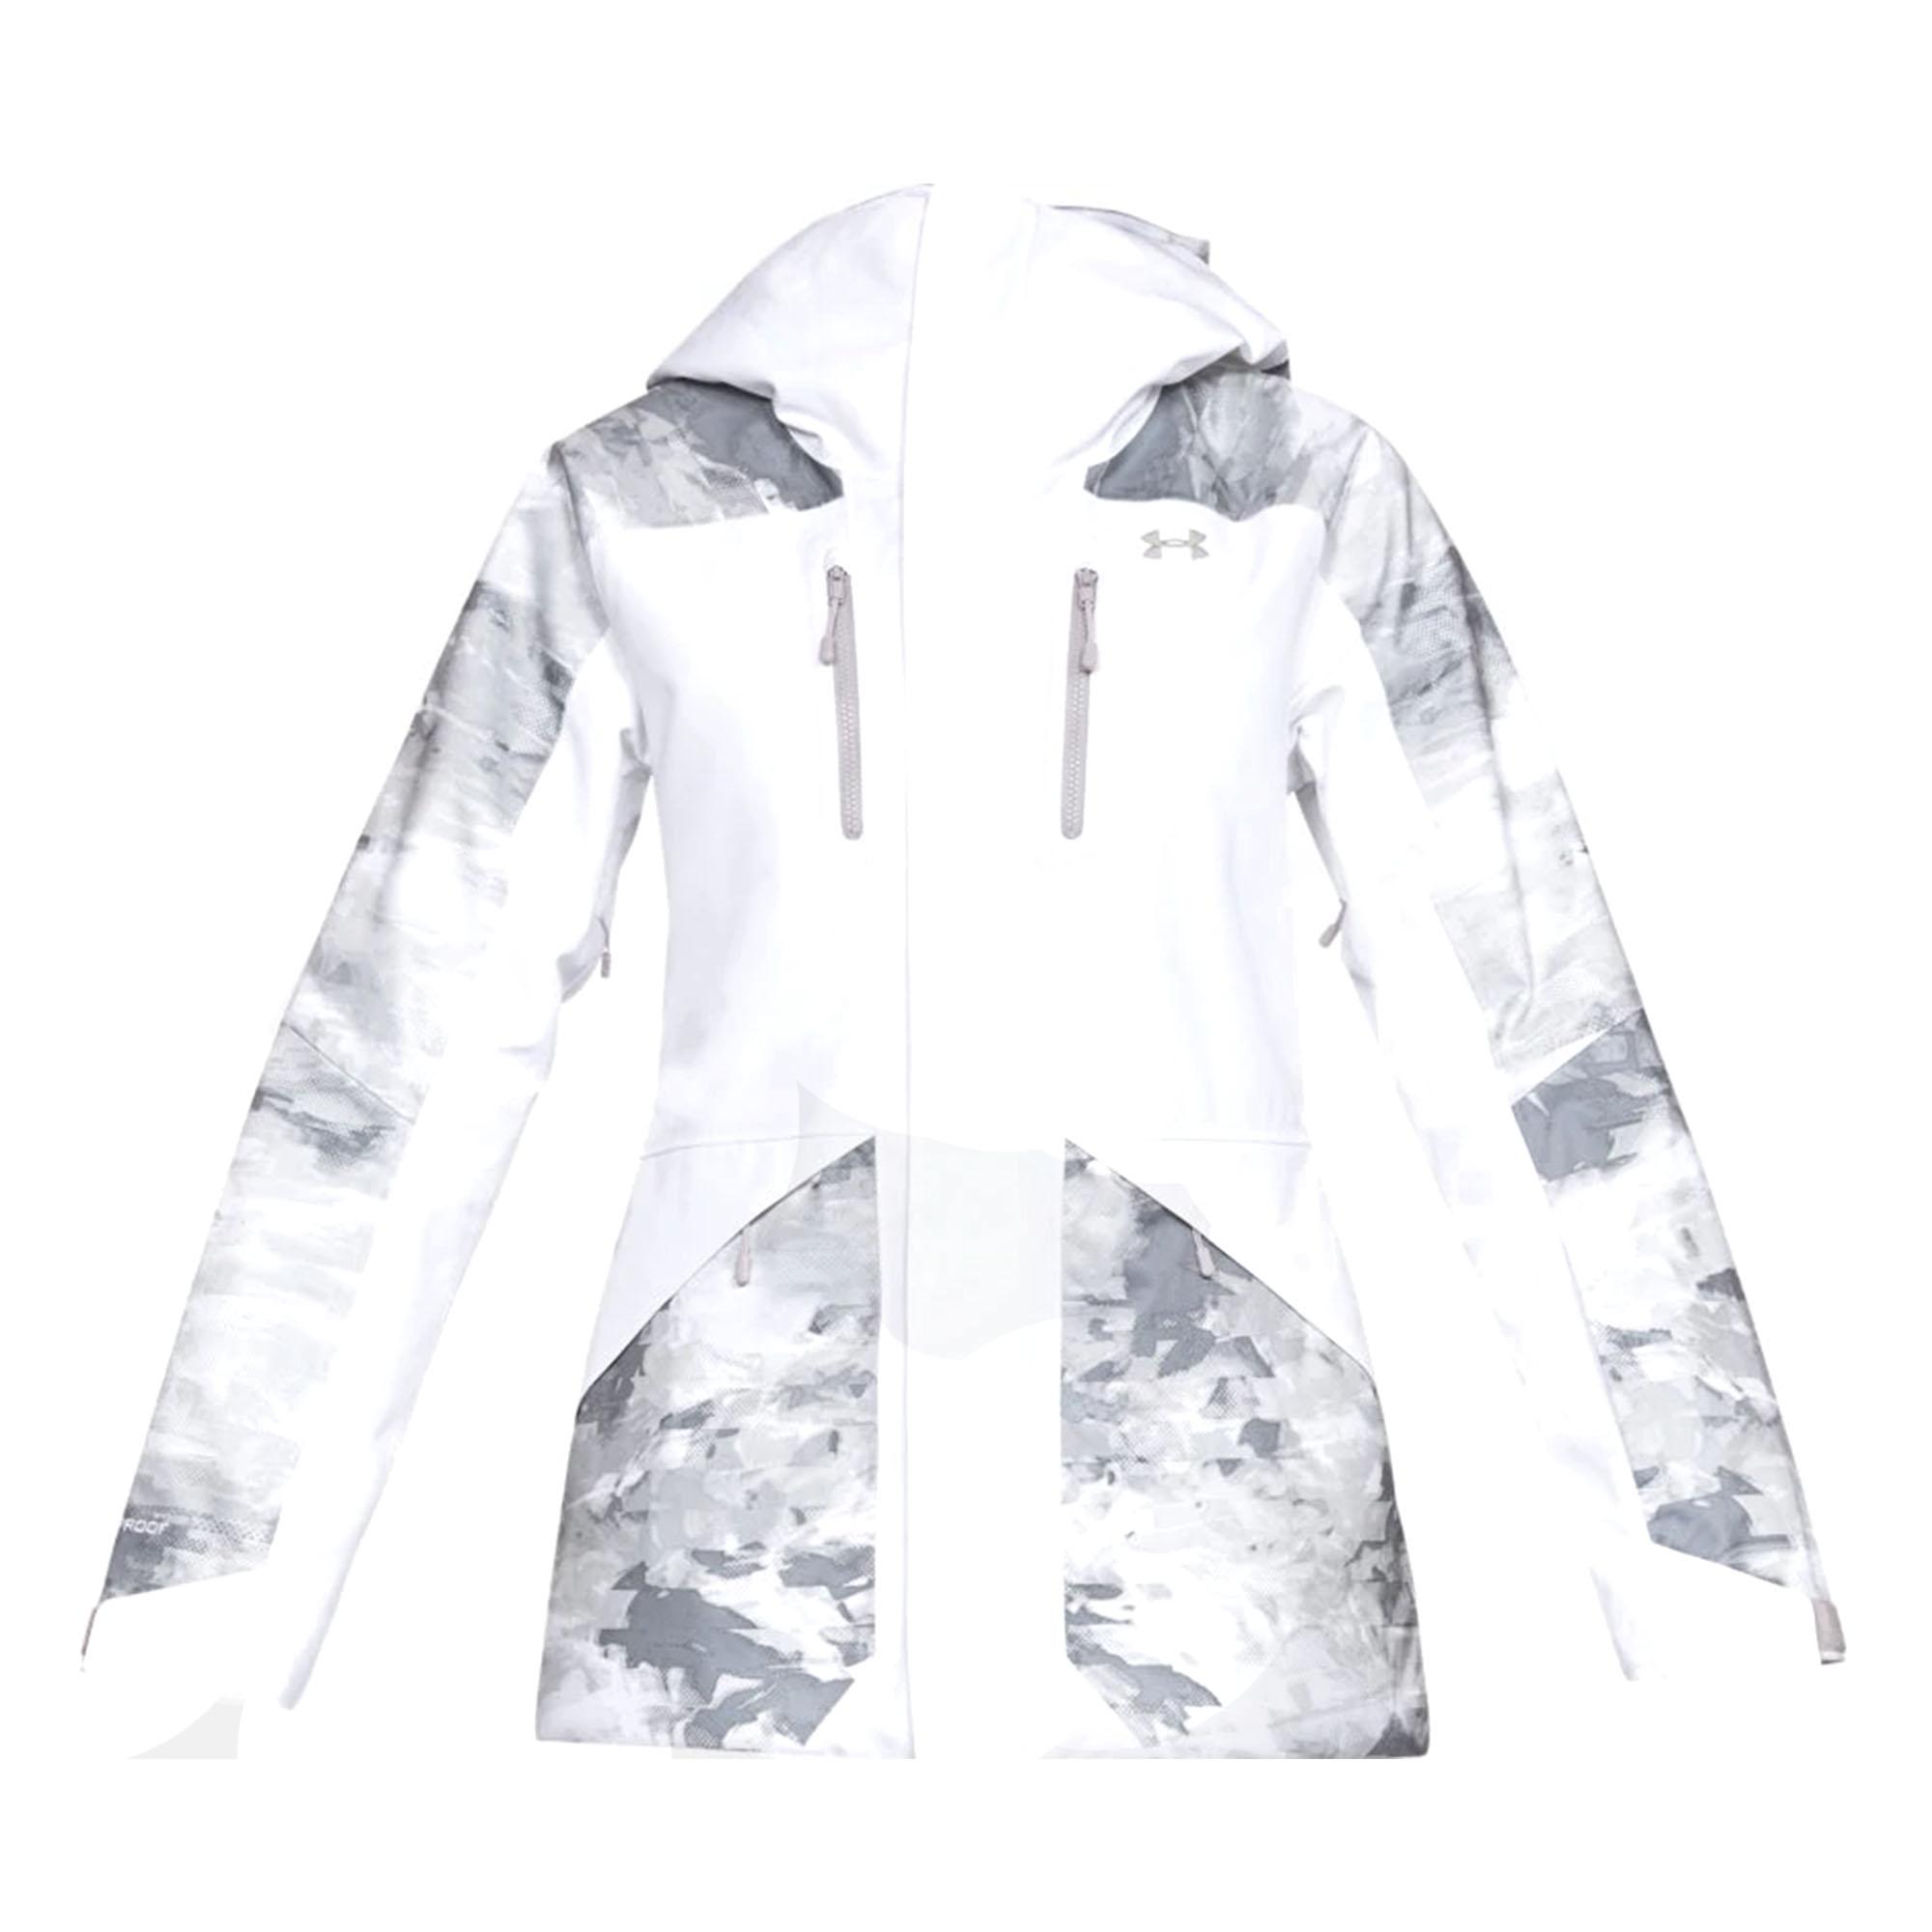 860d7654afe75 Under Armour Women s Emergent Ski Jacket - Sun   Ski Sports